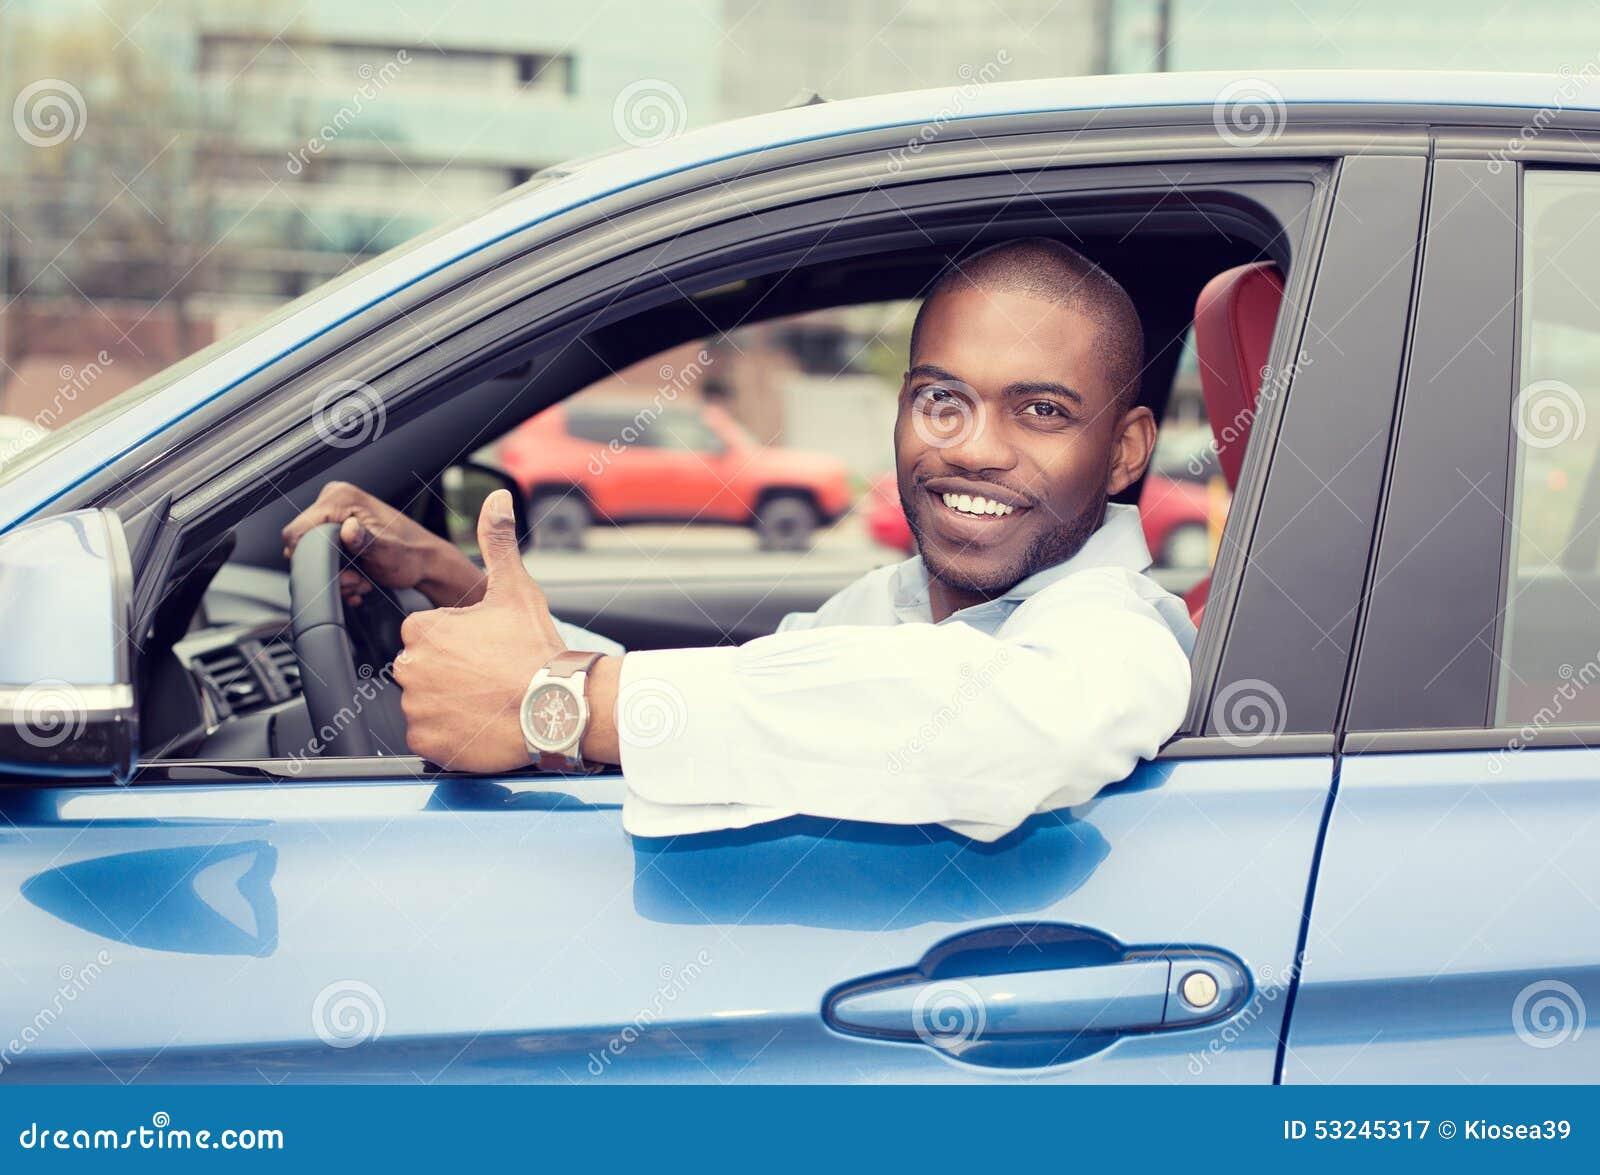 Black People Car Loan Aproved